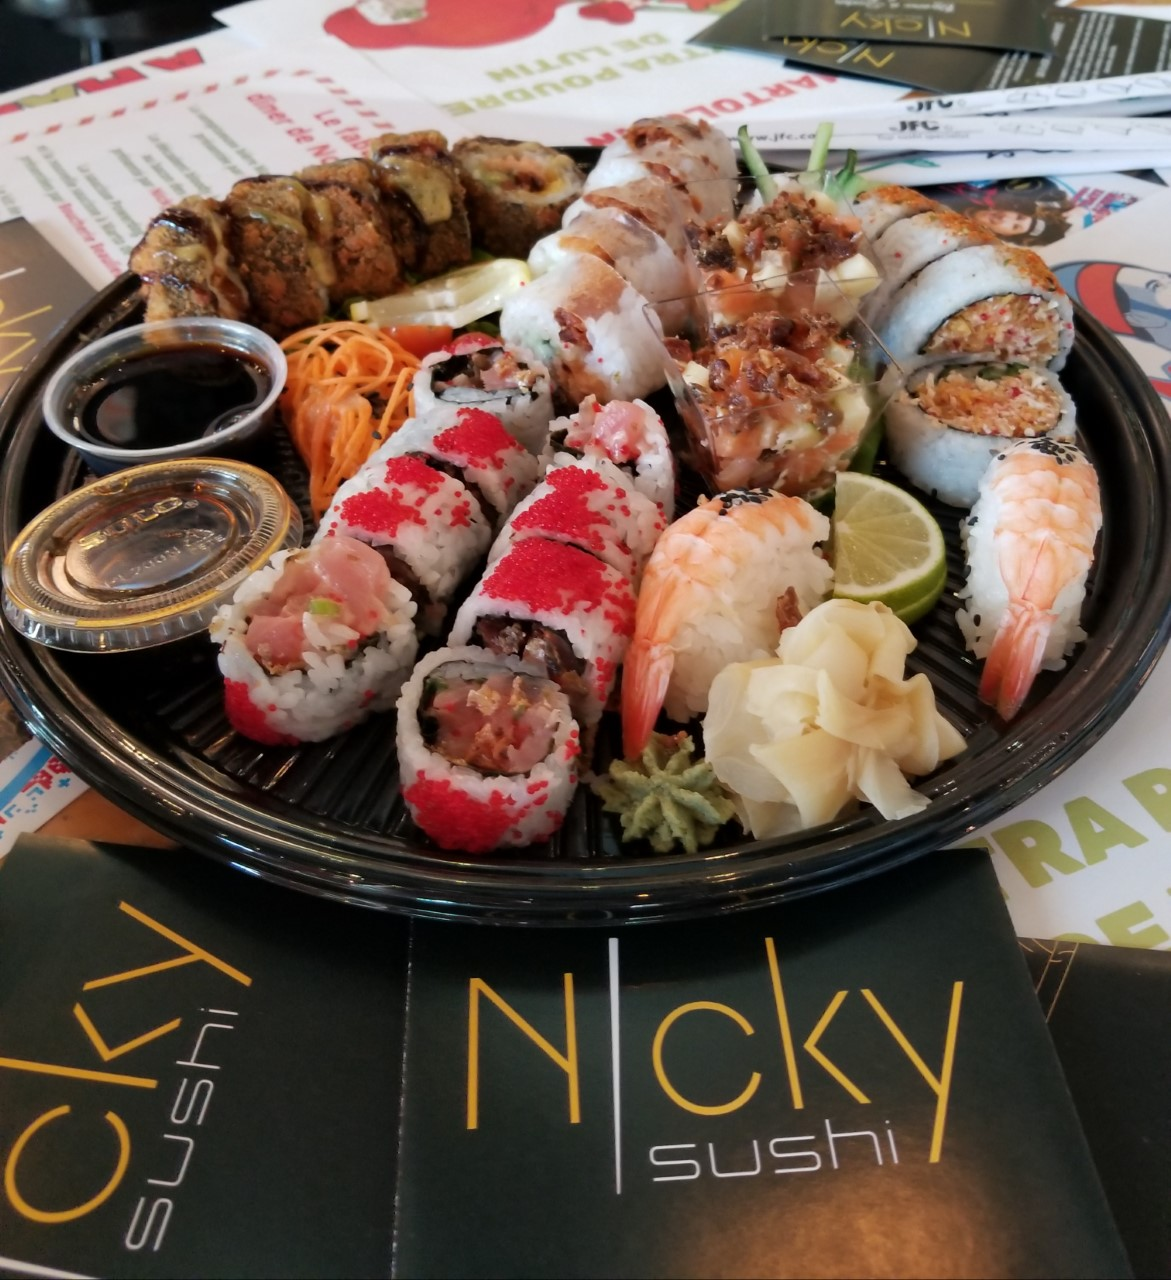 Nicky Sushi